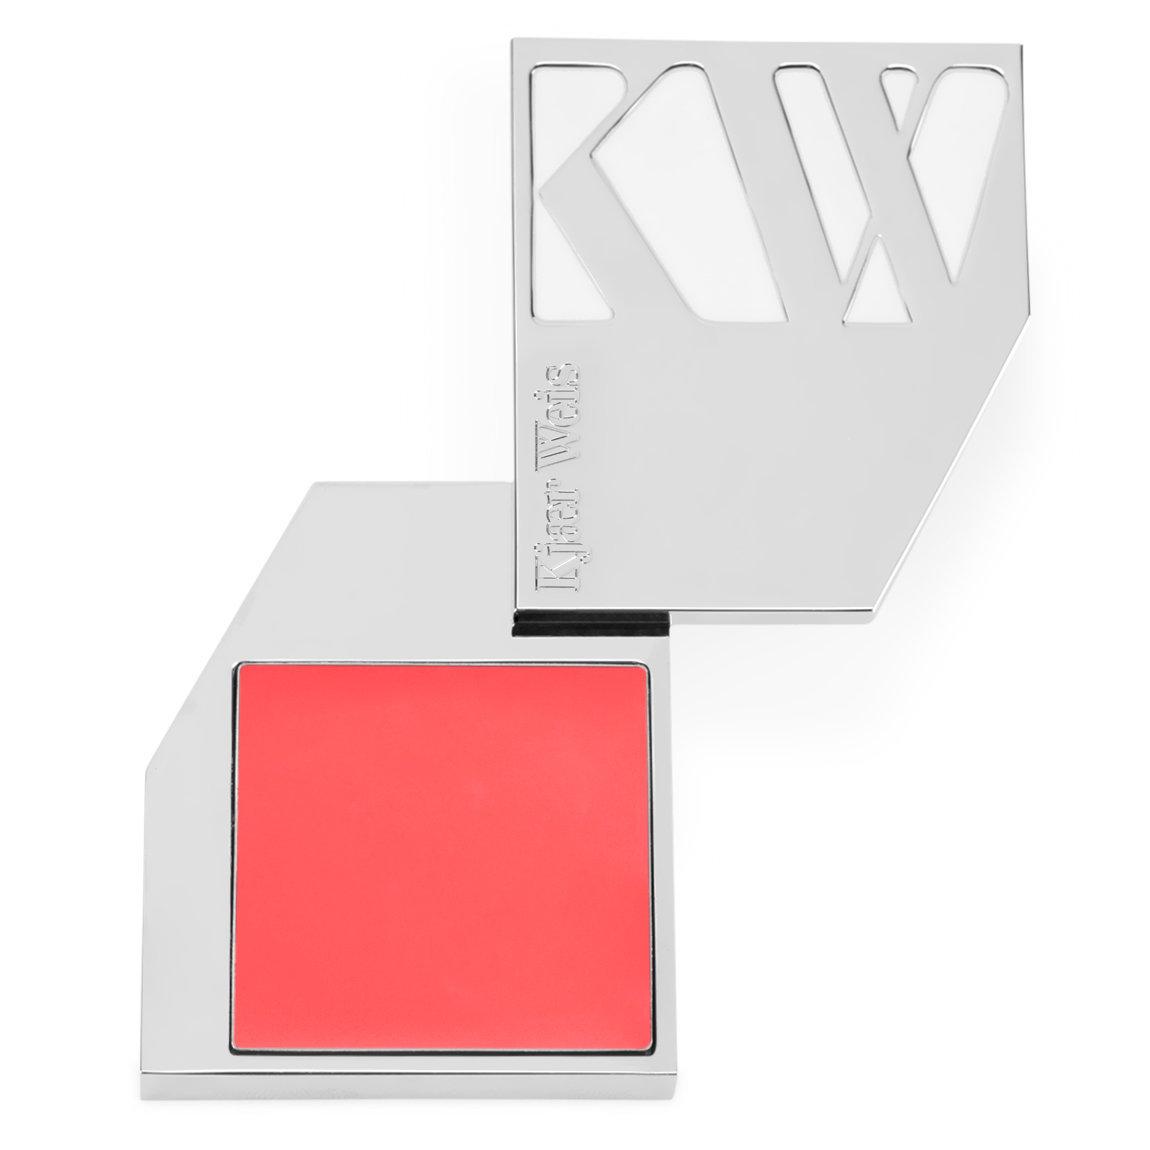 Kjaer Weis Cream Blush Above and Beyond alternative view 1.